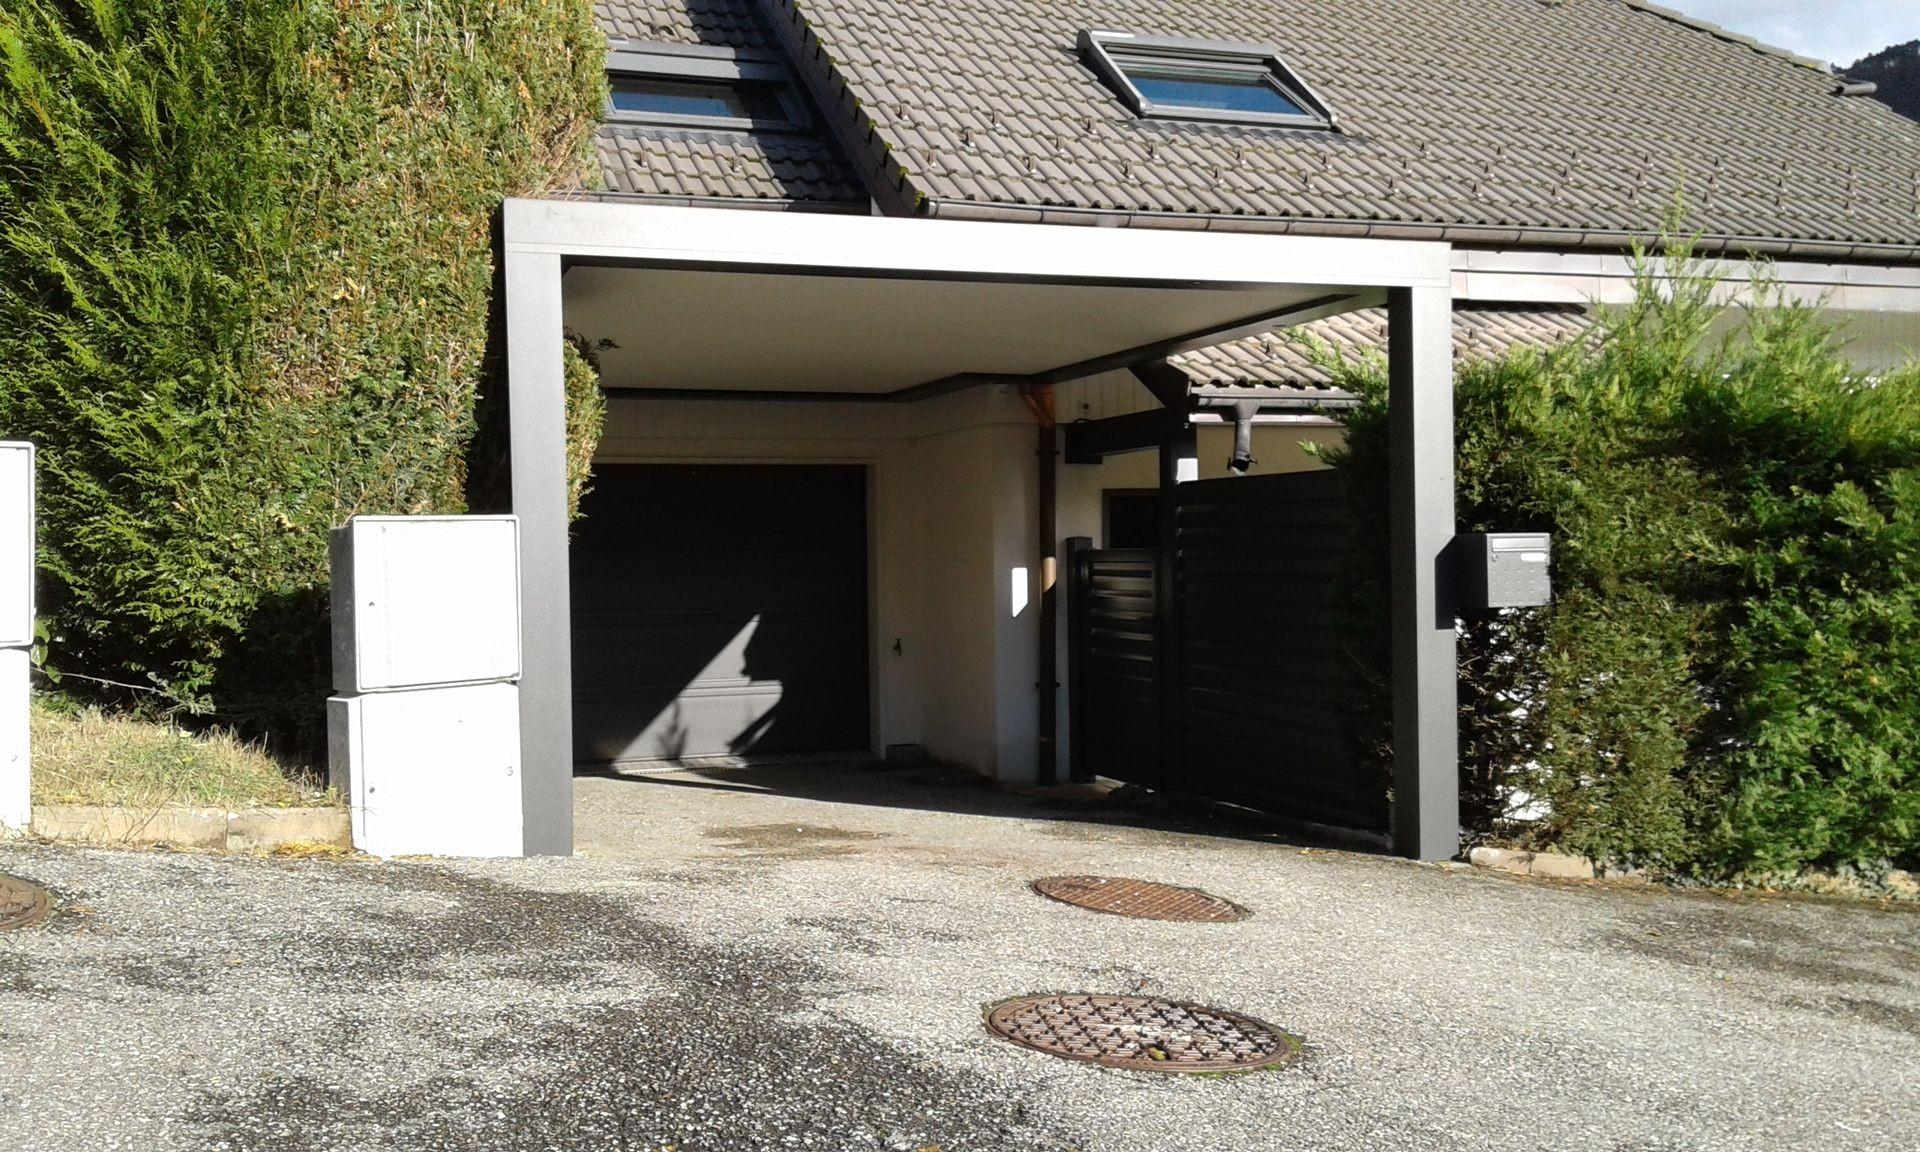 Carport en haute savoie 74 et abri de voiture actuel veranda for Fermer carport en garage